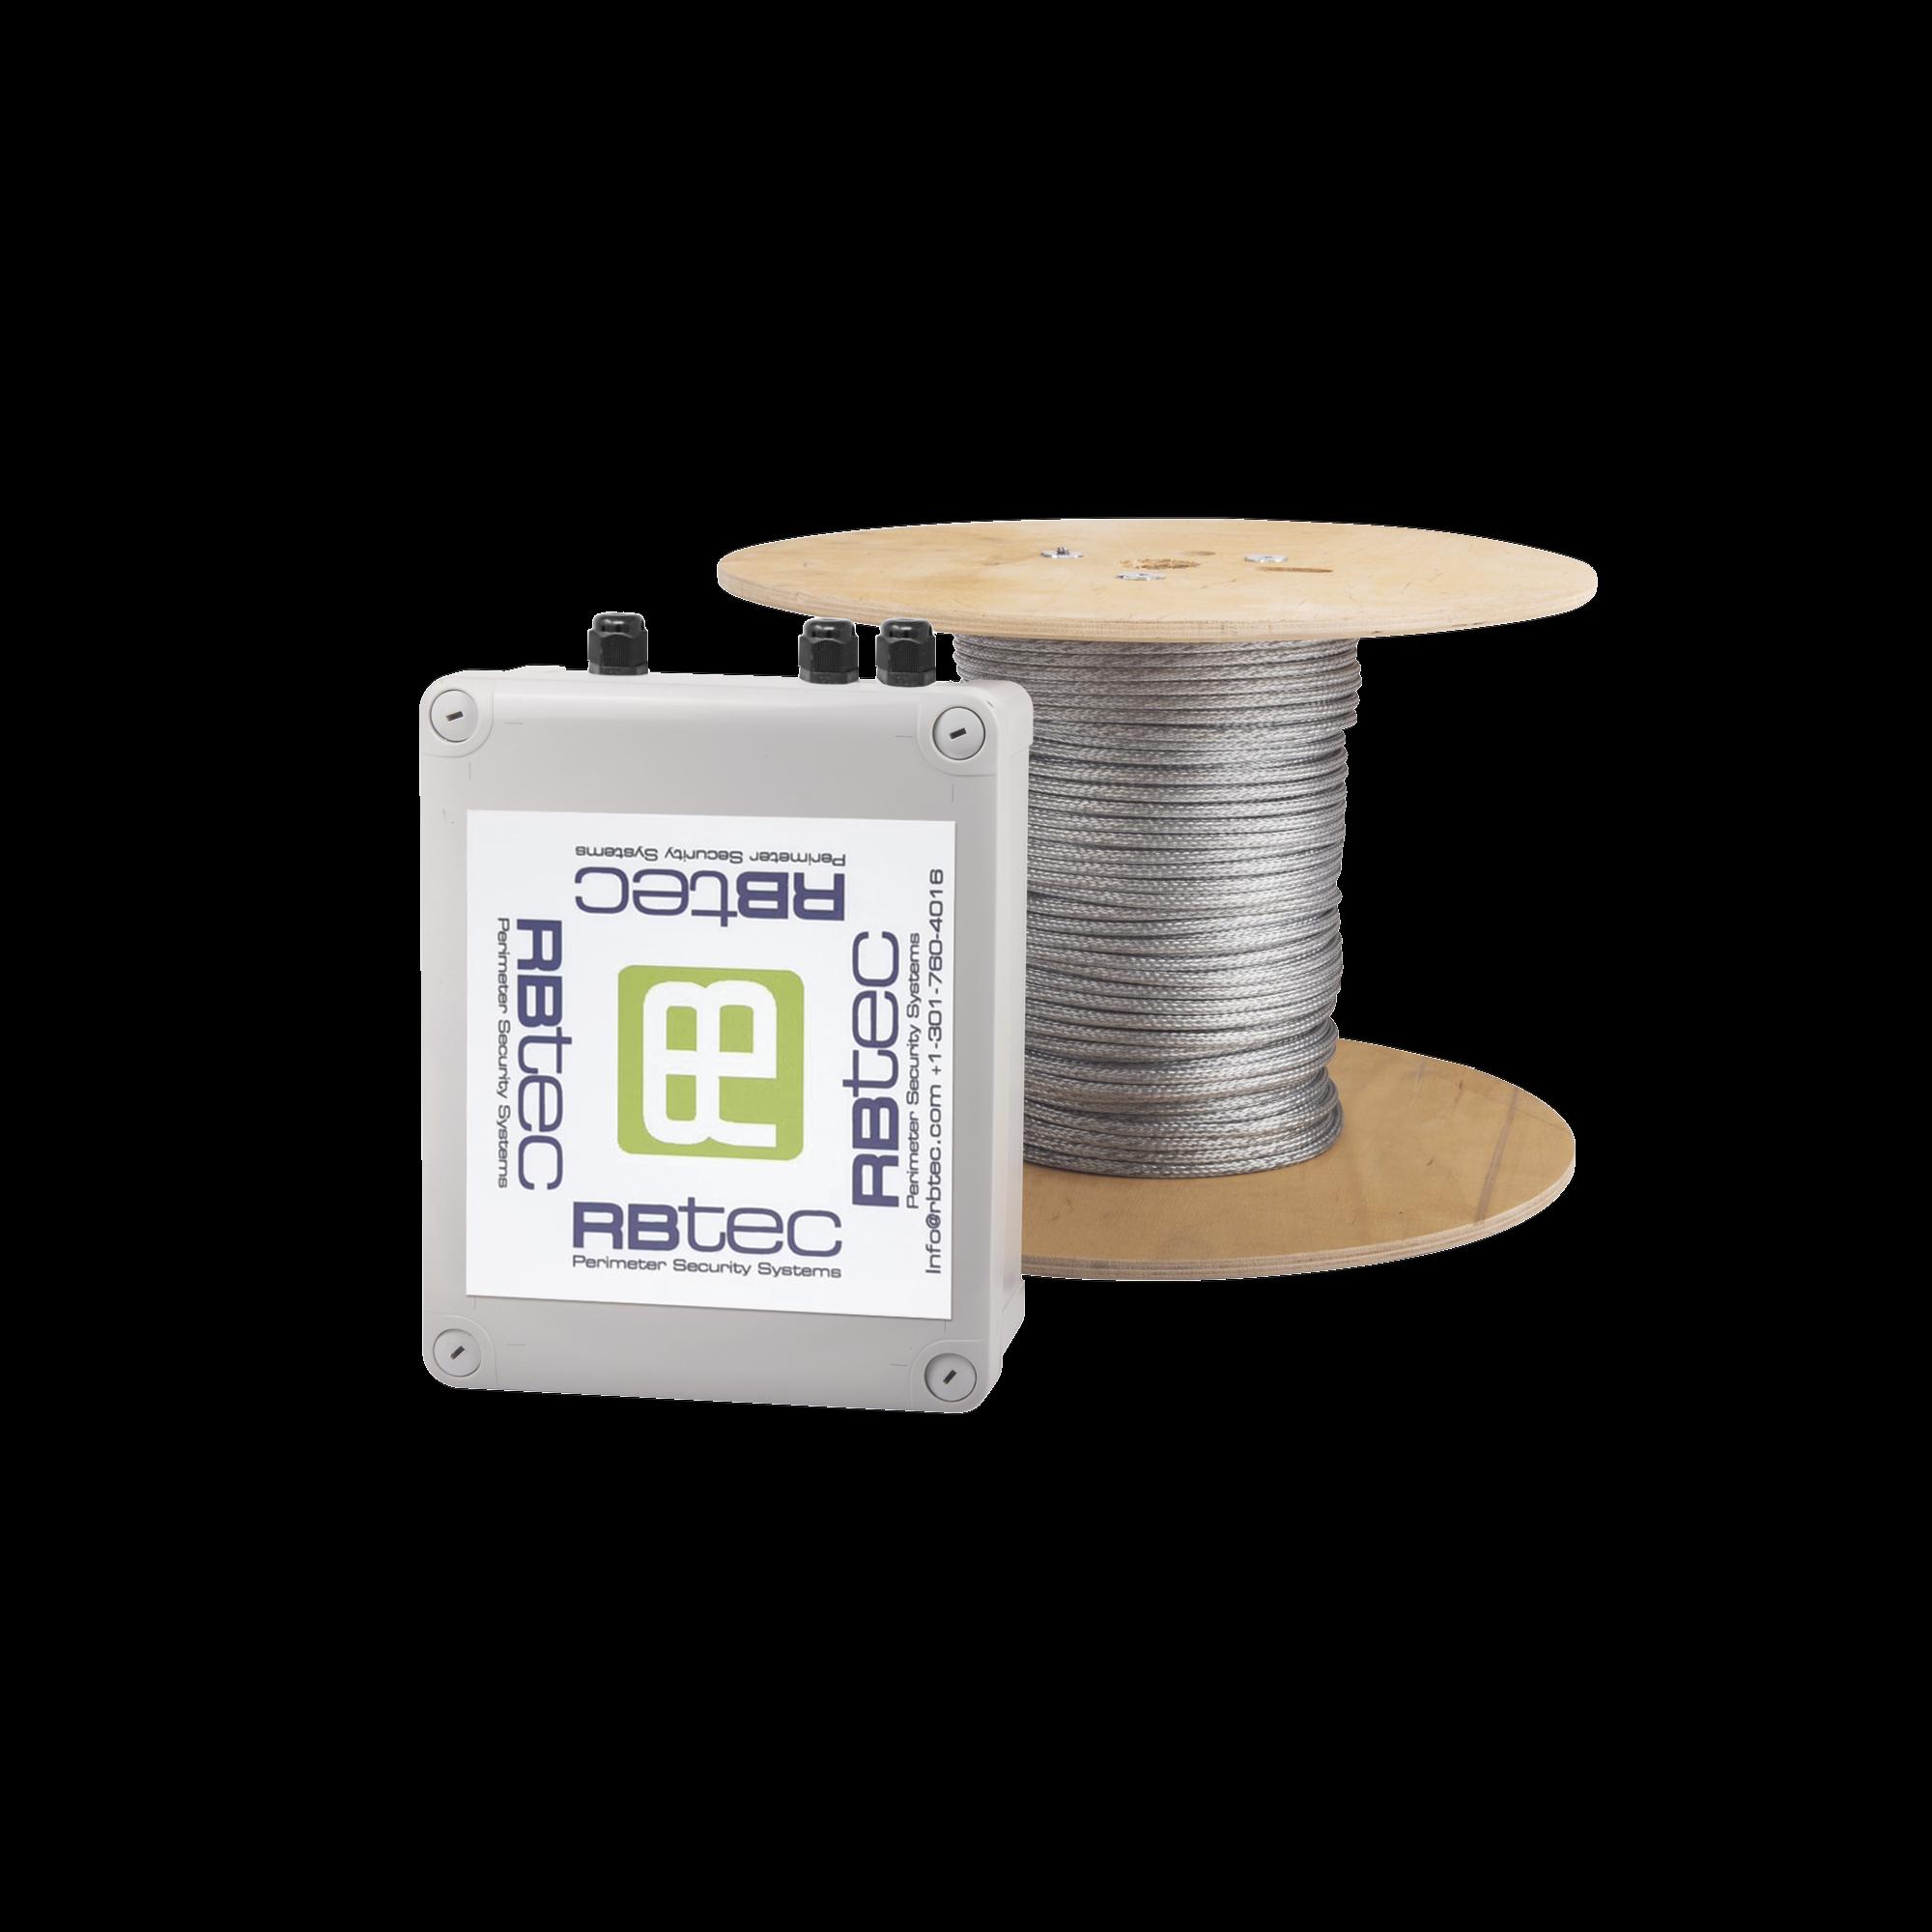 Kit de Cable Sensor Perimetral IRONCLAD para Cercas Ciclónicas / 152 METROS / 1 ZONA / Sin Falsas Alarmas por Viento / TODO Incluido